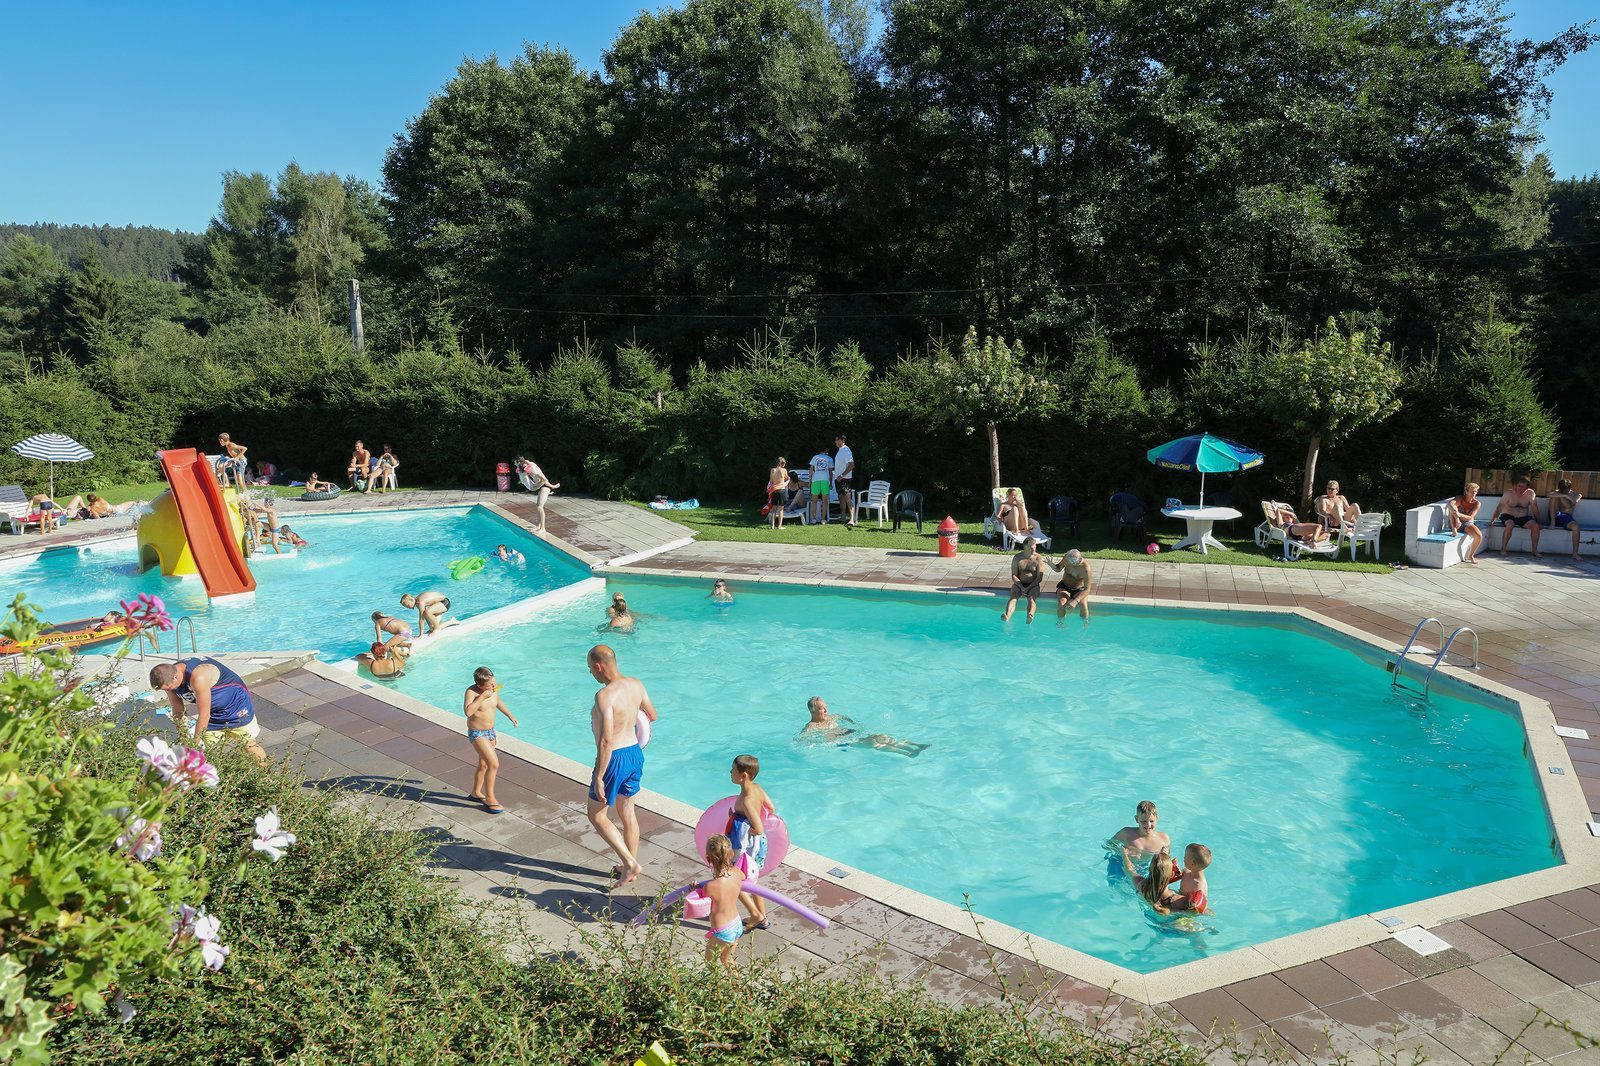 Facilities - Swimming pool | Petite Suisse